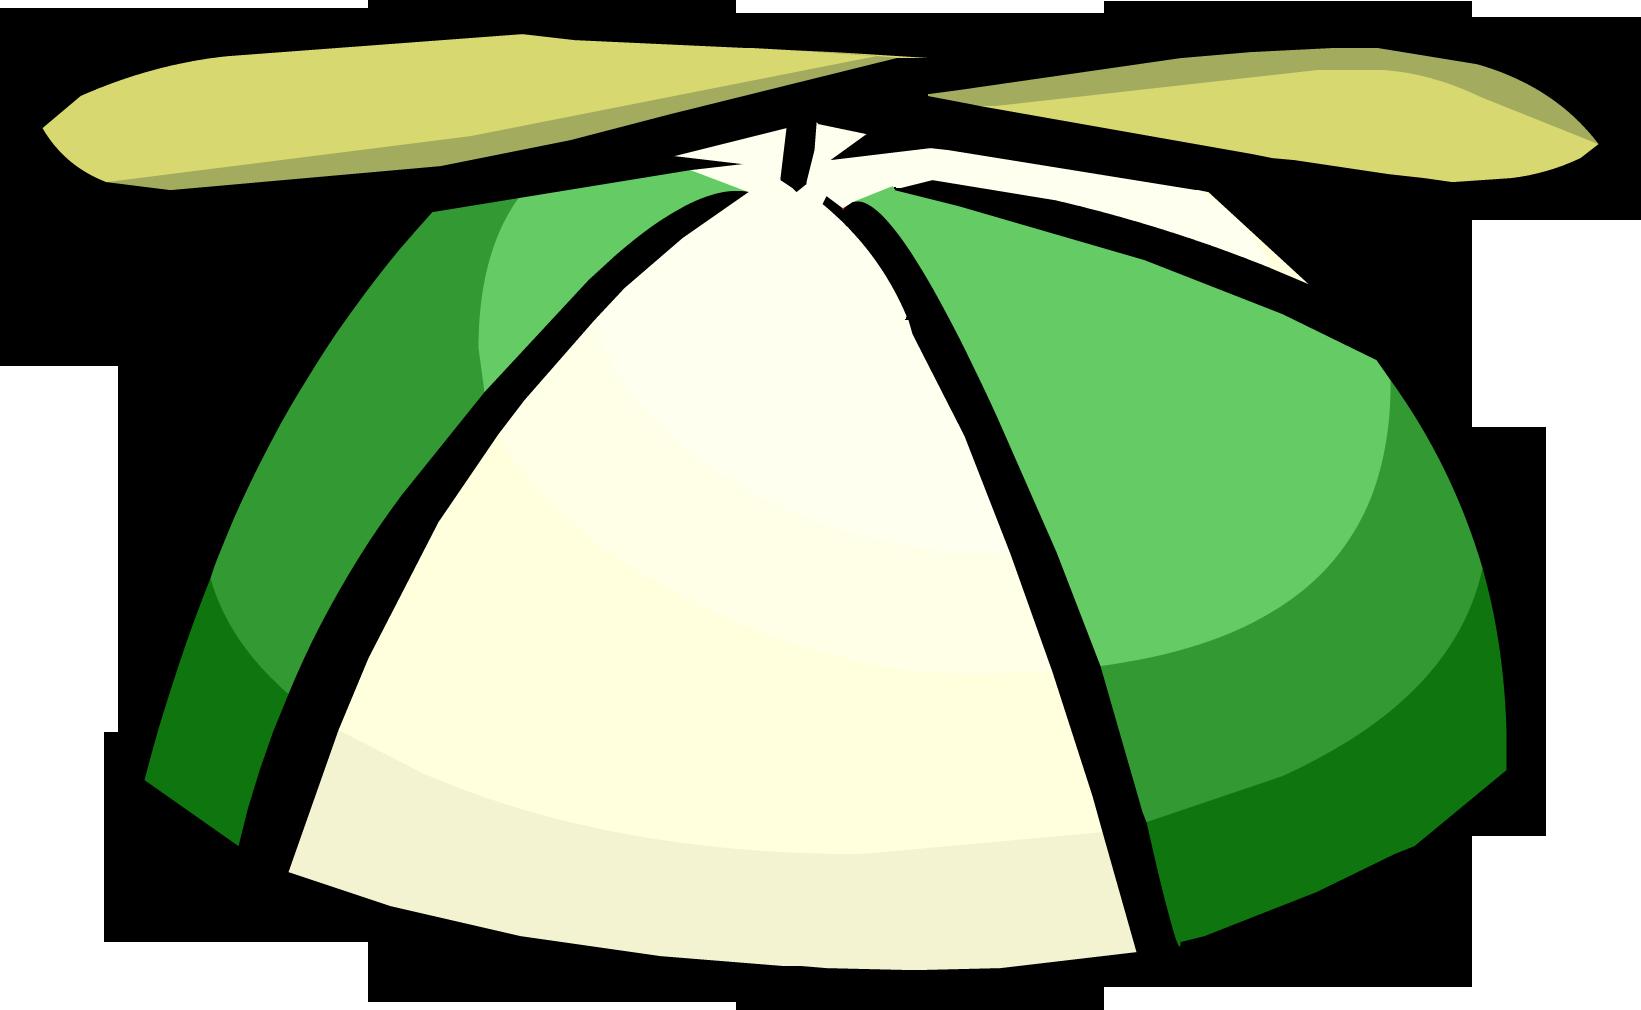 Gorra con Hélice Verde